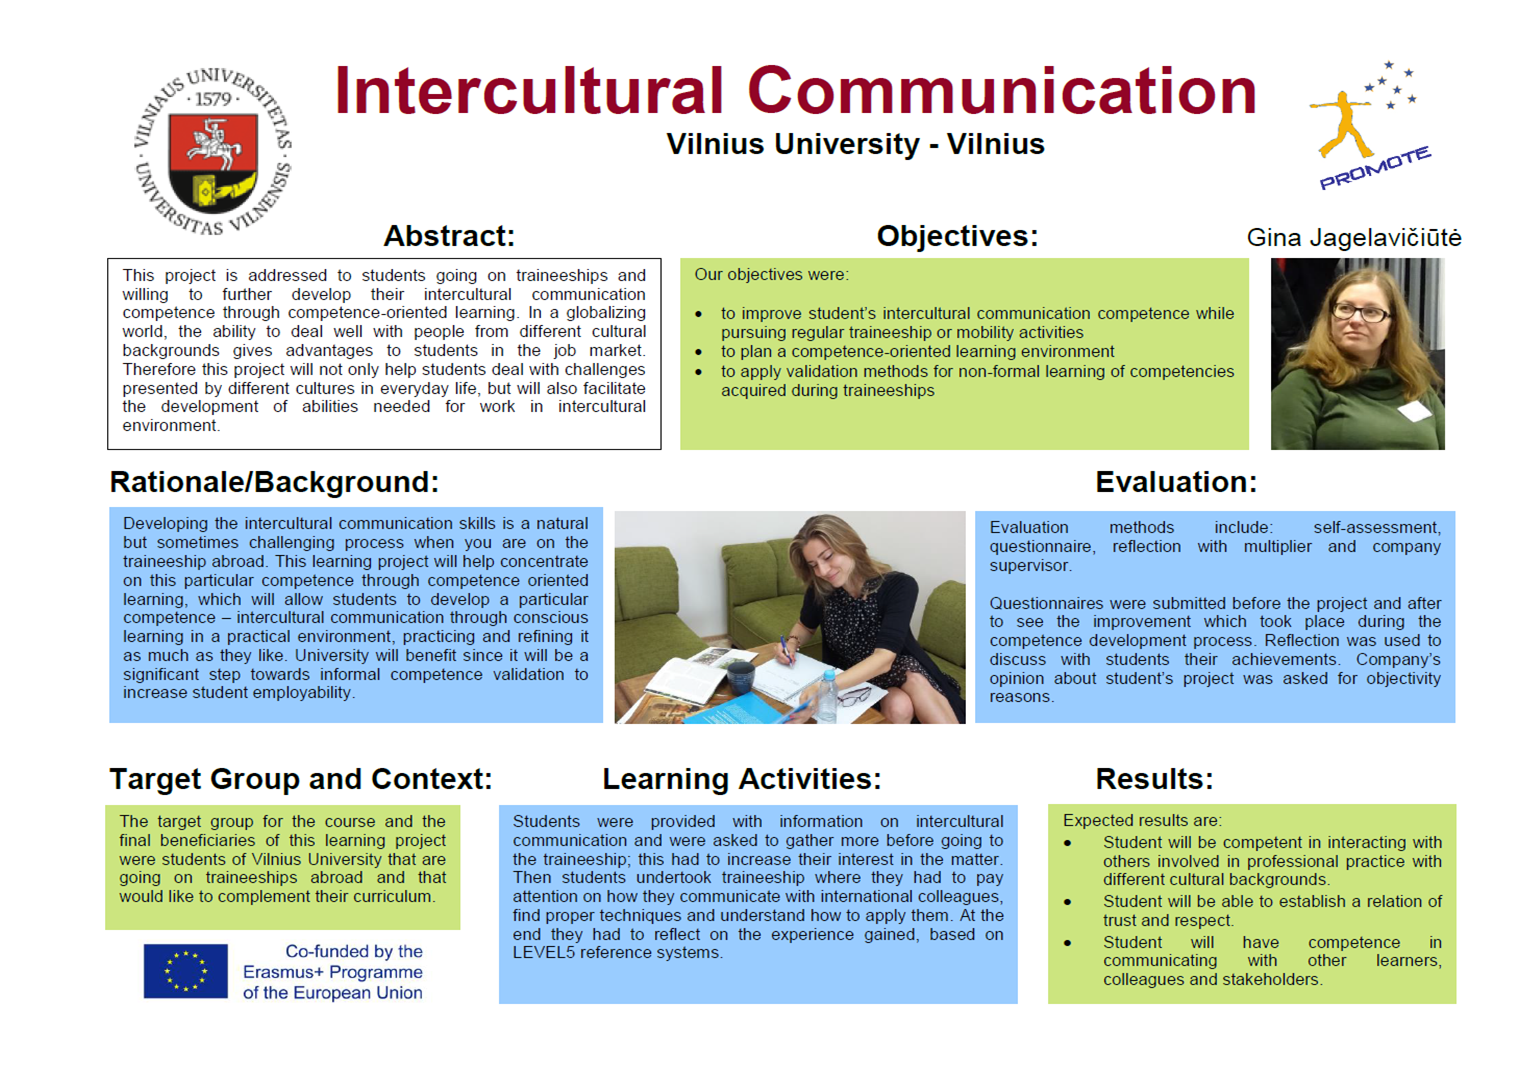 UV_Intercultural_communication.png